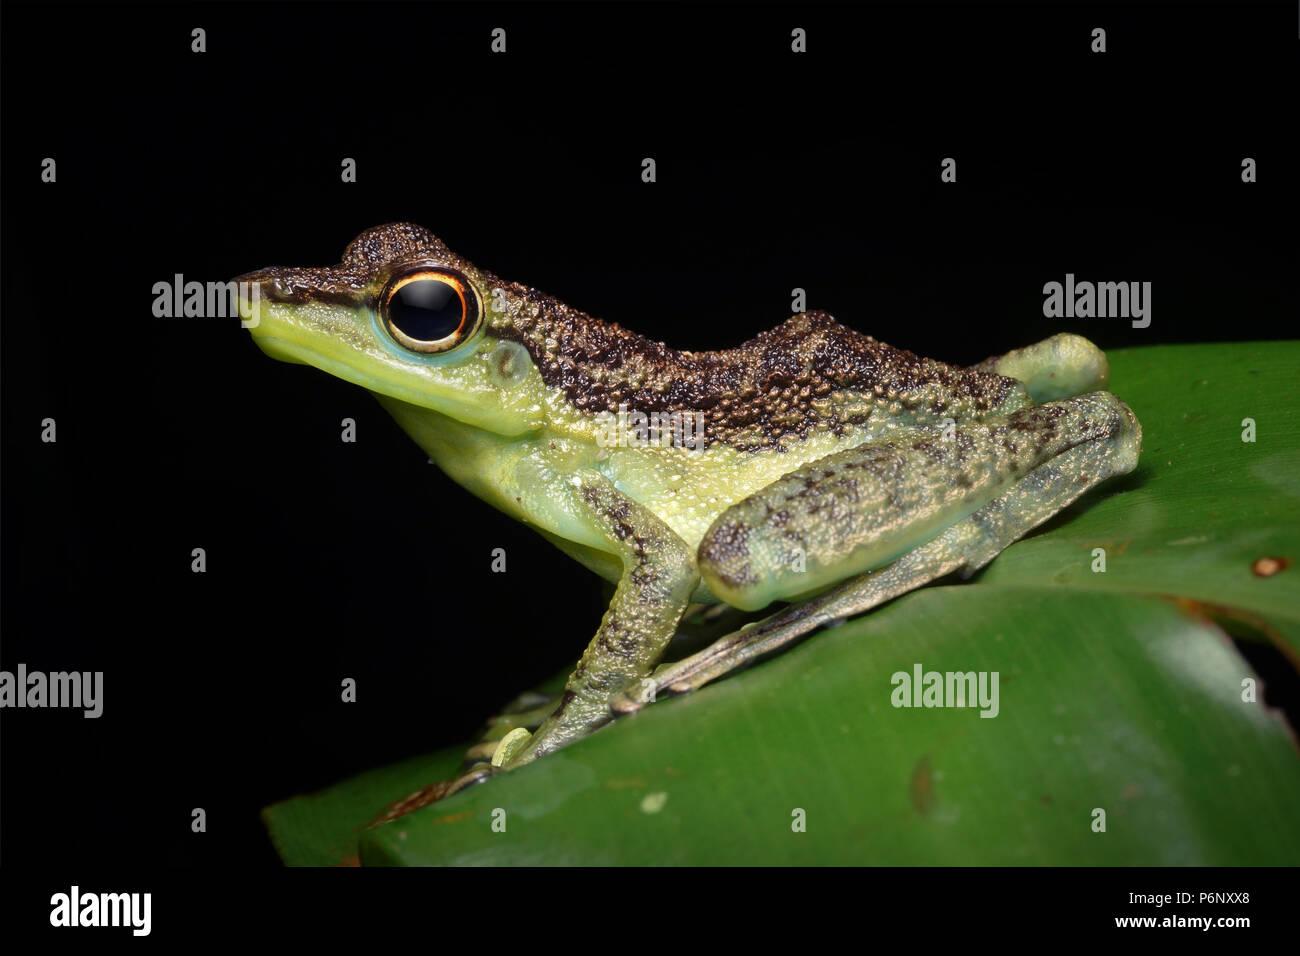 Black-spotted rock skipper Staurois guttatus - Stock Image